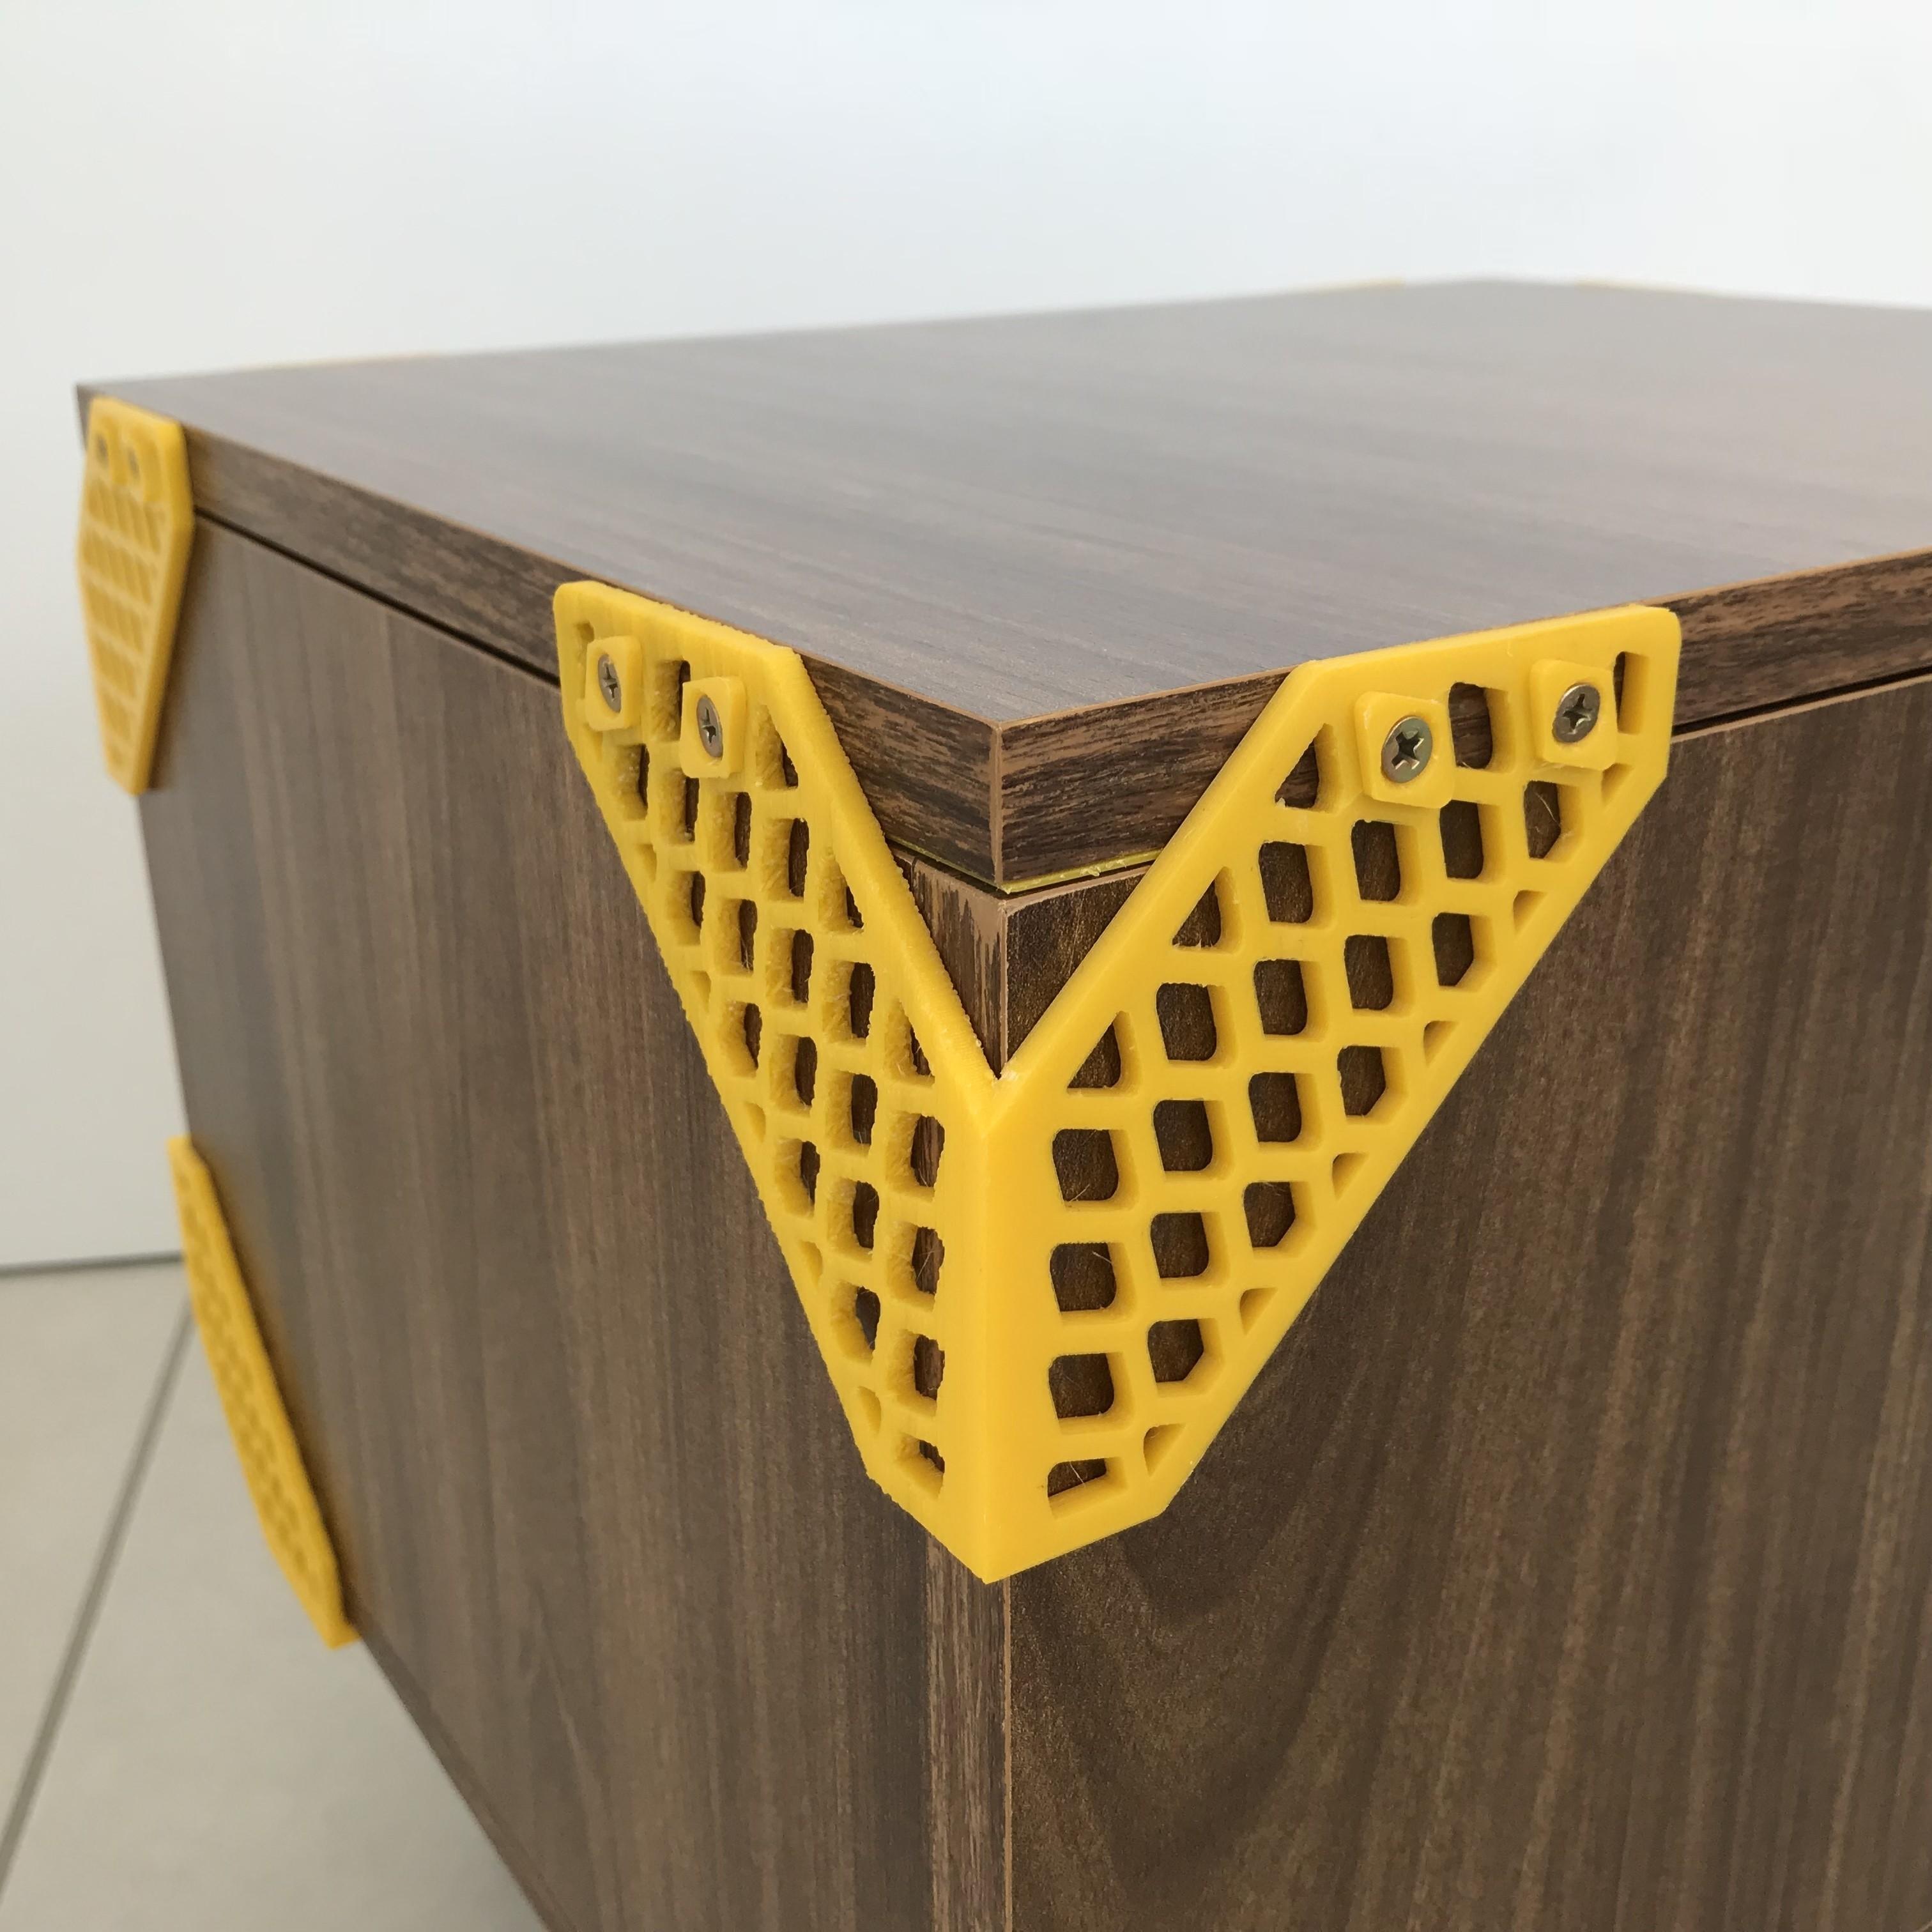 Mateus Machado_Cantoneira Trama _Print Mobi_01.JPG Download free STL file Furniture Cantoneiras Trama Print Mobi • 3D printing template, mateusmachado